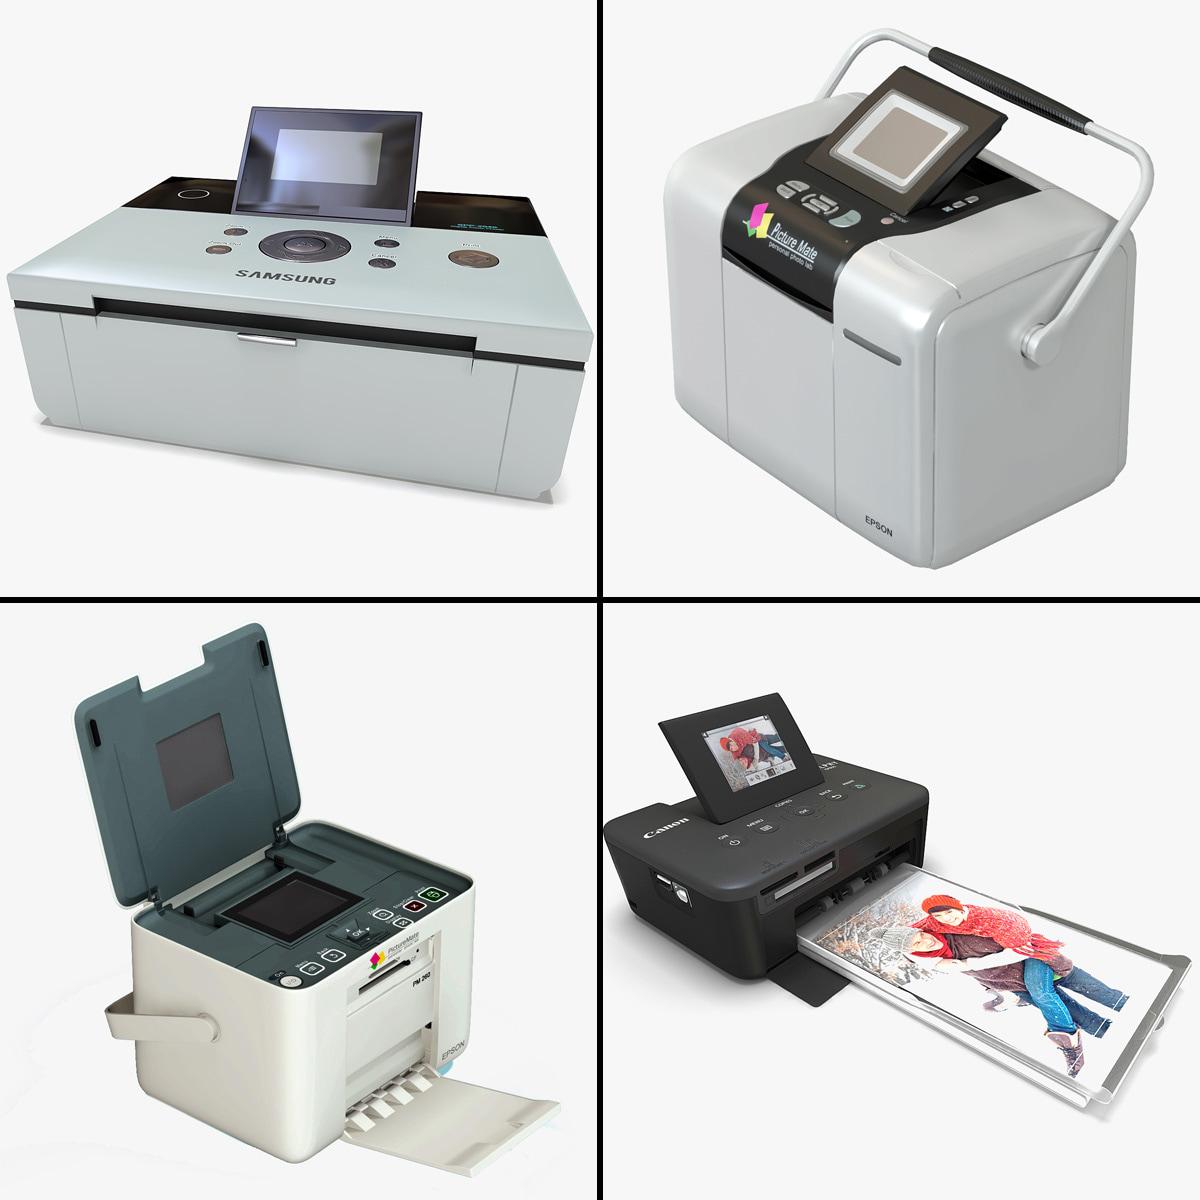 Printers_Collection_V1_000.jpg